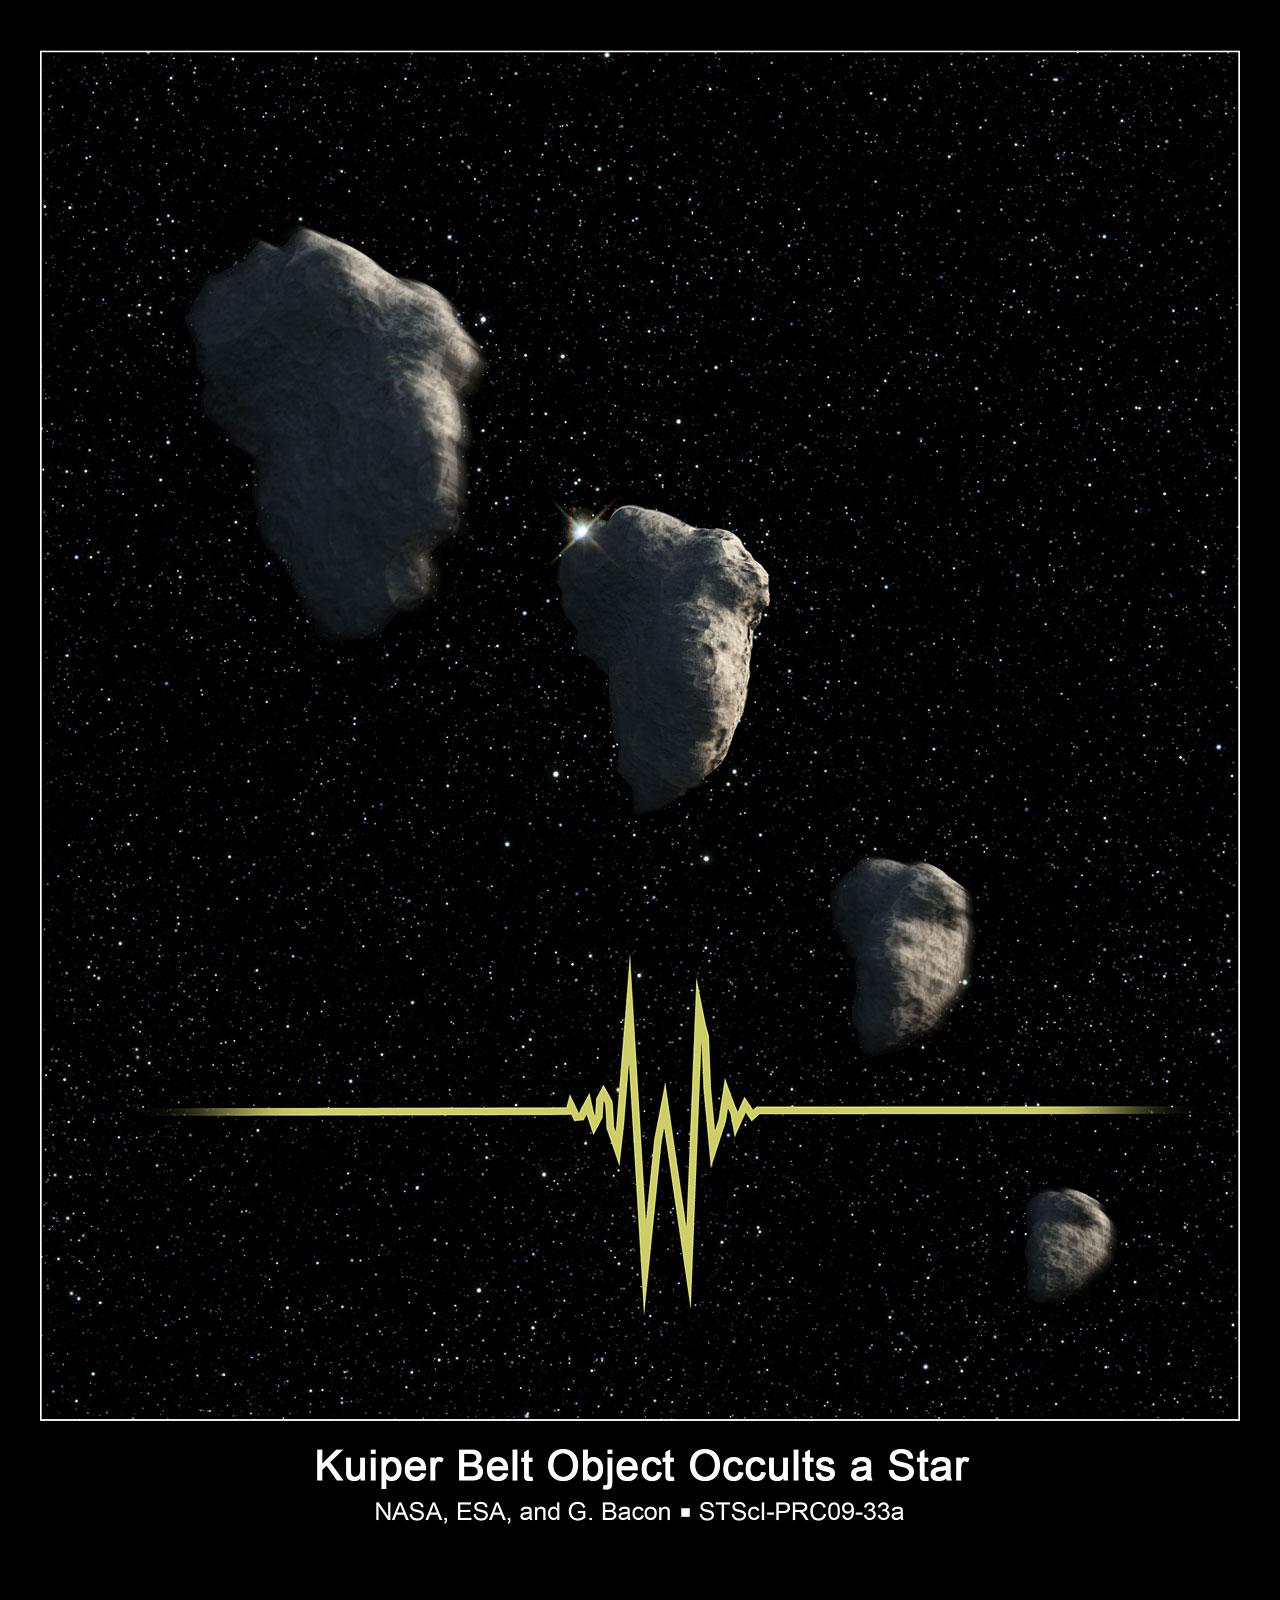 Kuiper Belt Object occults star